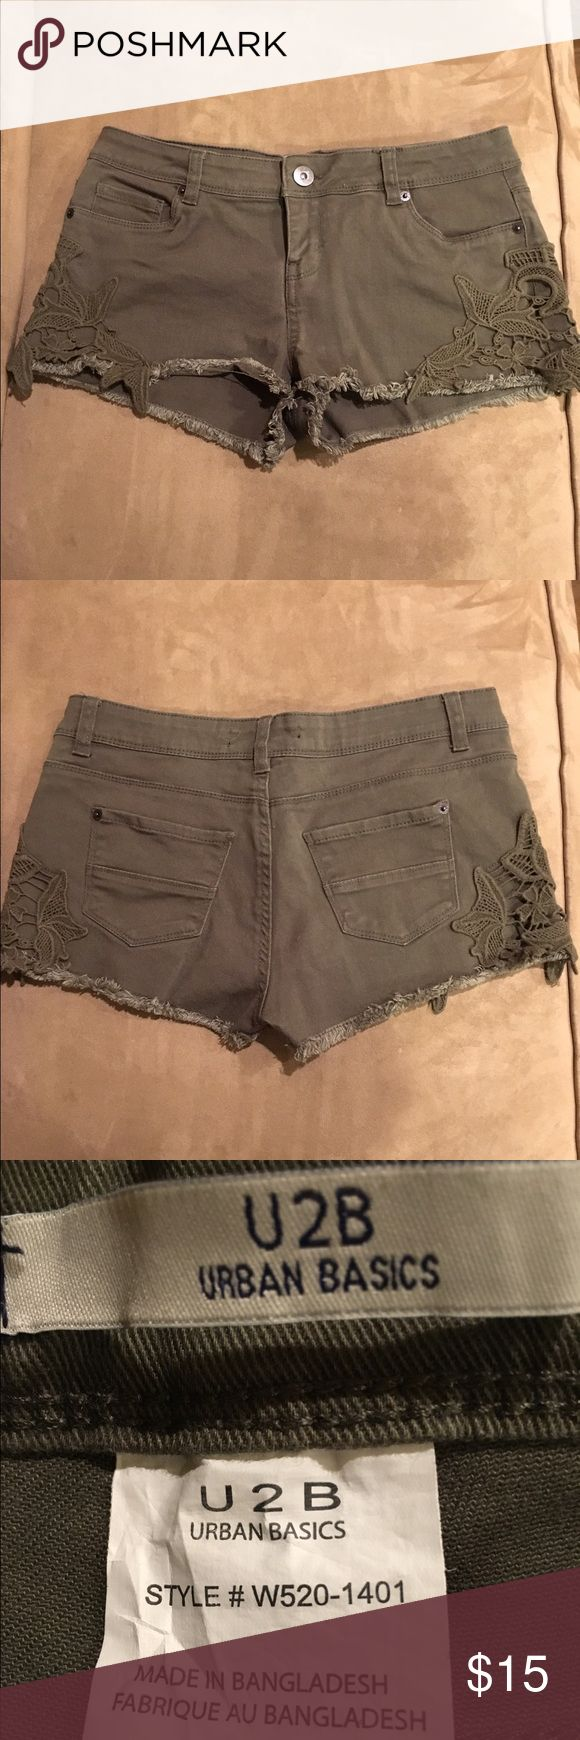 "U2B Urban Basics Green Cutoff Shorts Excellent condition. Adorned with green lace on each leg. Inseam: 1"" Leg Opening: 24"" 98% cotton 2% spandex U2B Urban Basics Shorts Jean Shorts"